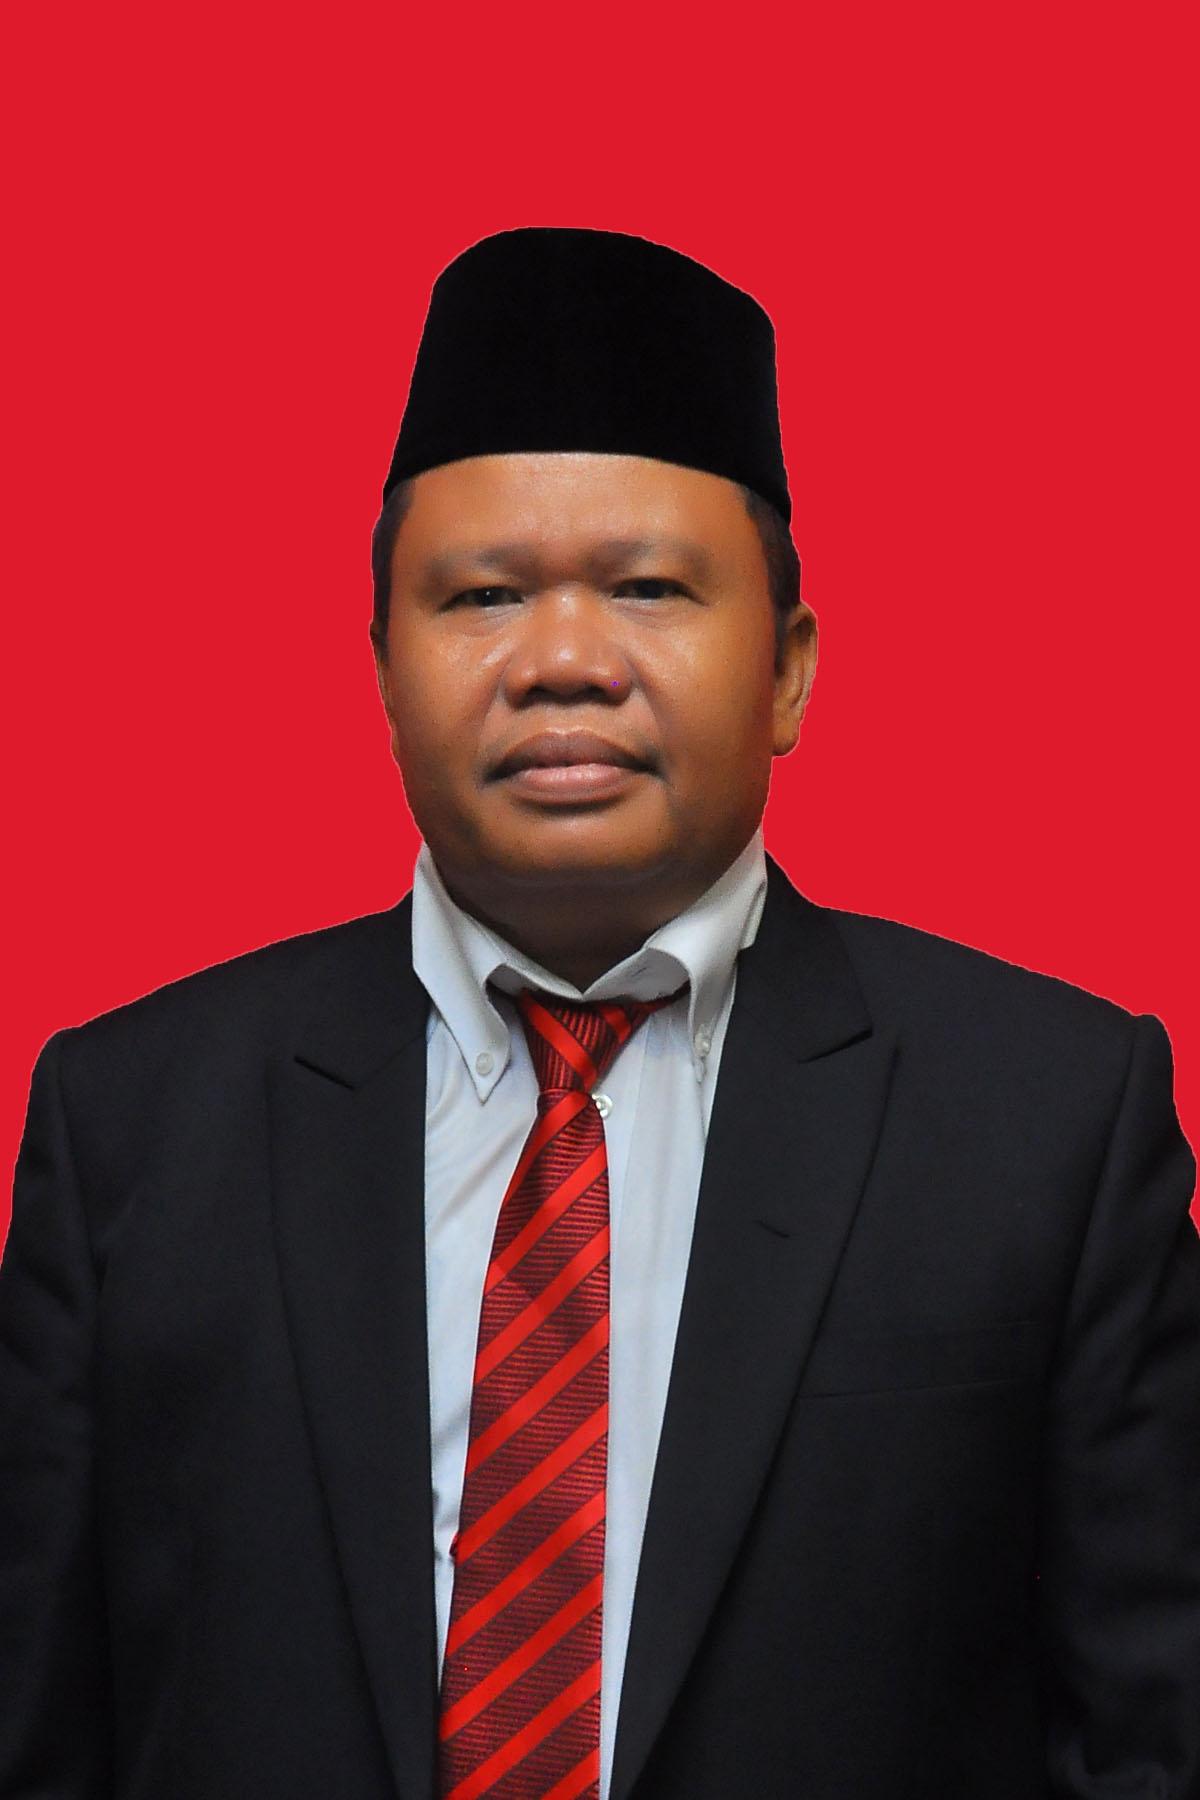 Drs. H. SYAHRUL EPENDI SIREGAR, M.EI